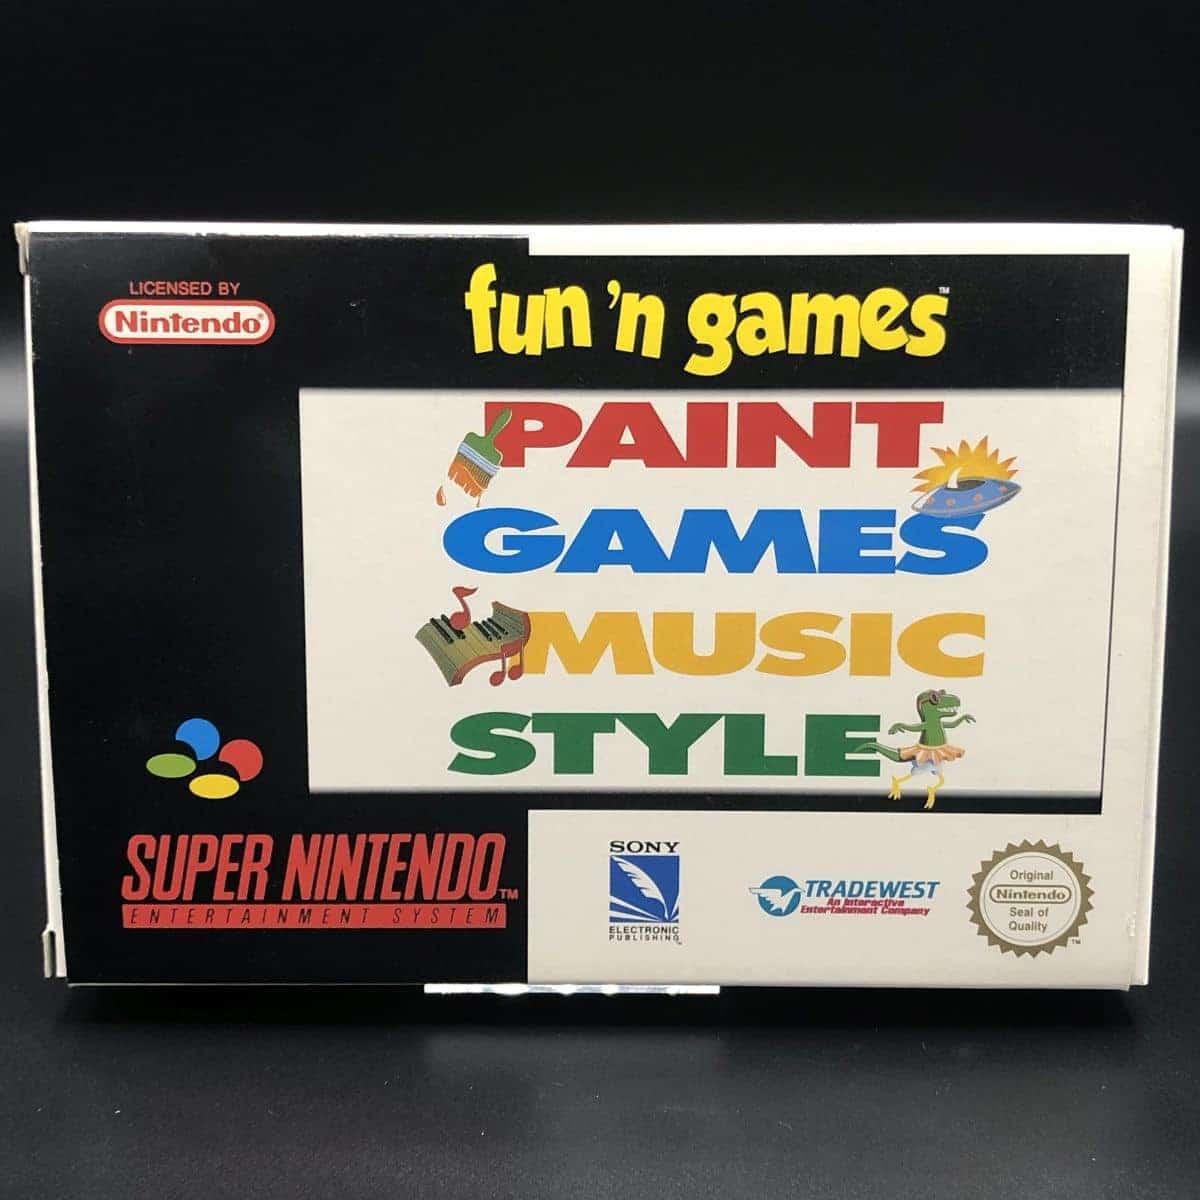 SNES Fun 'n Games (Komplett) (Sehr gut) Super Nintendo